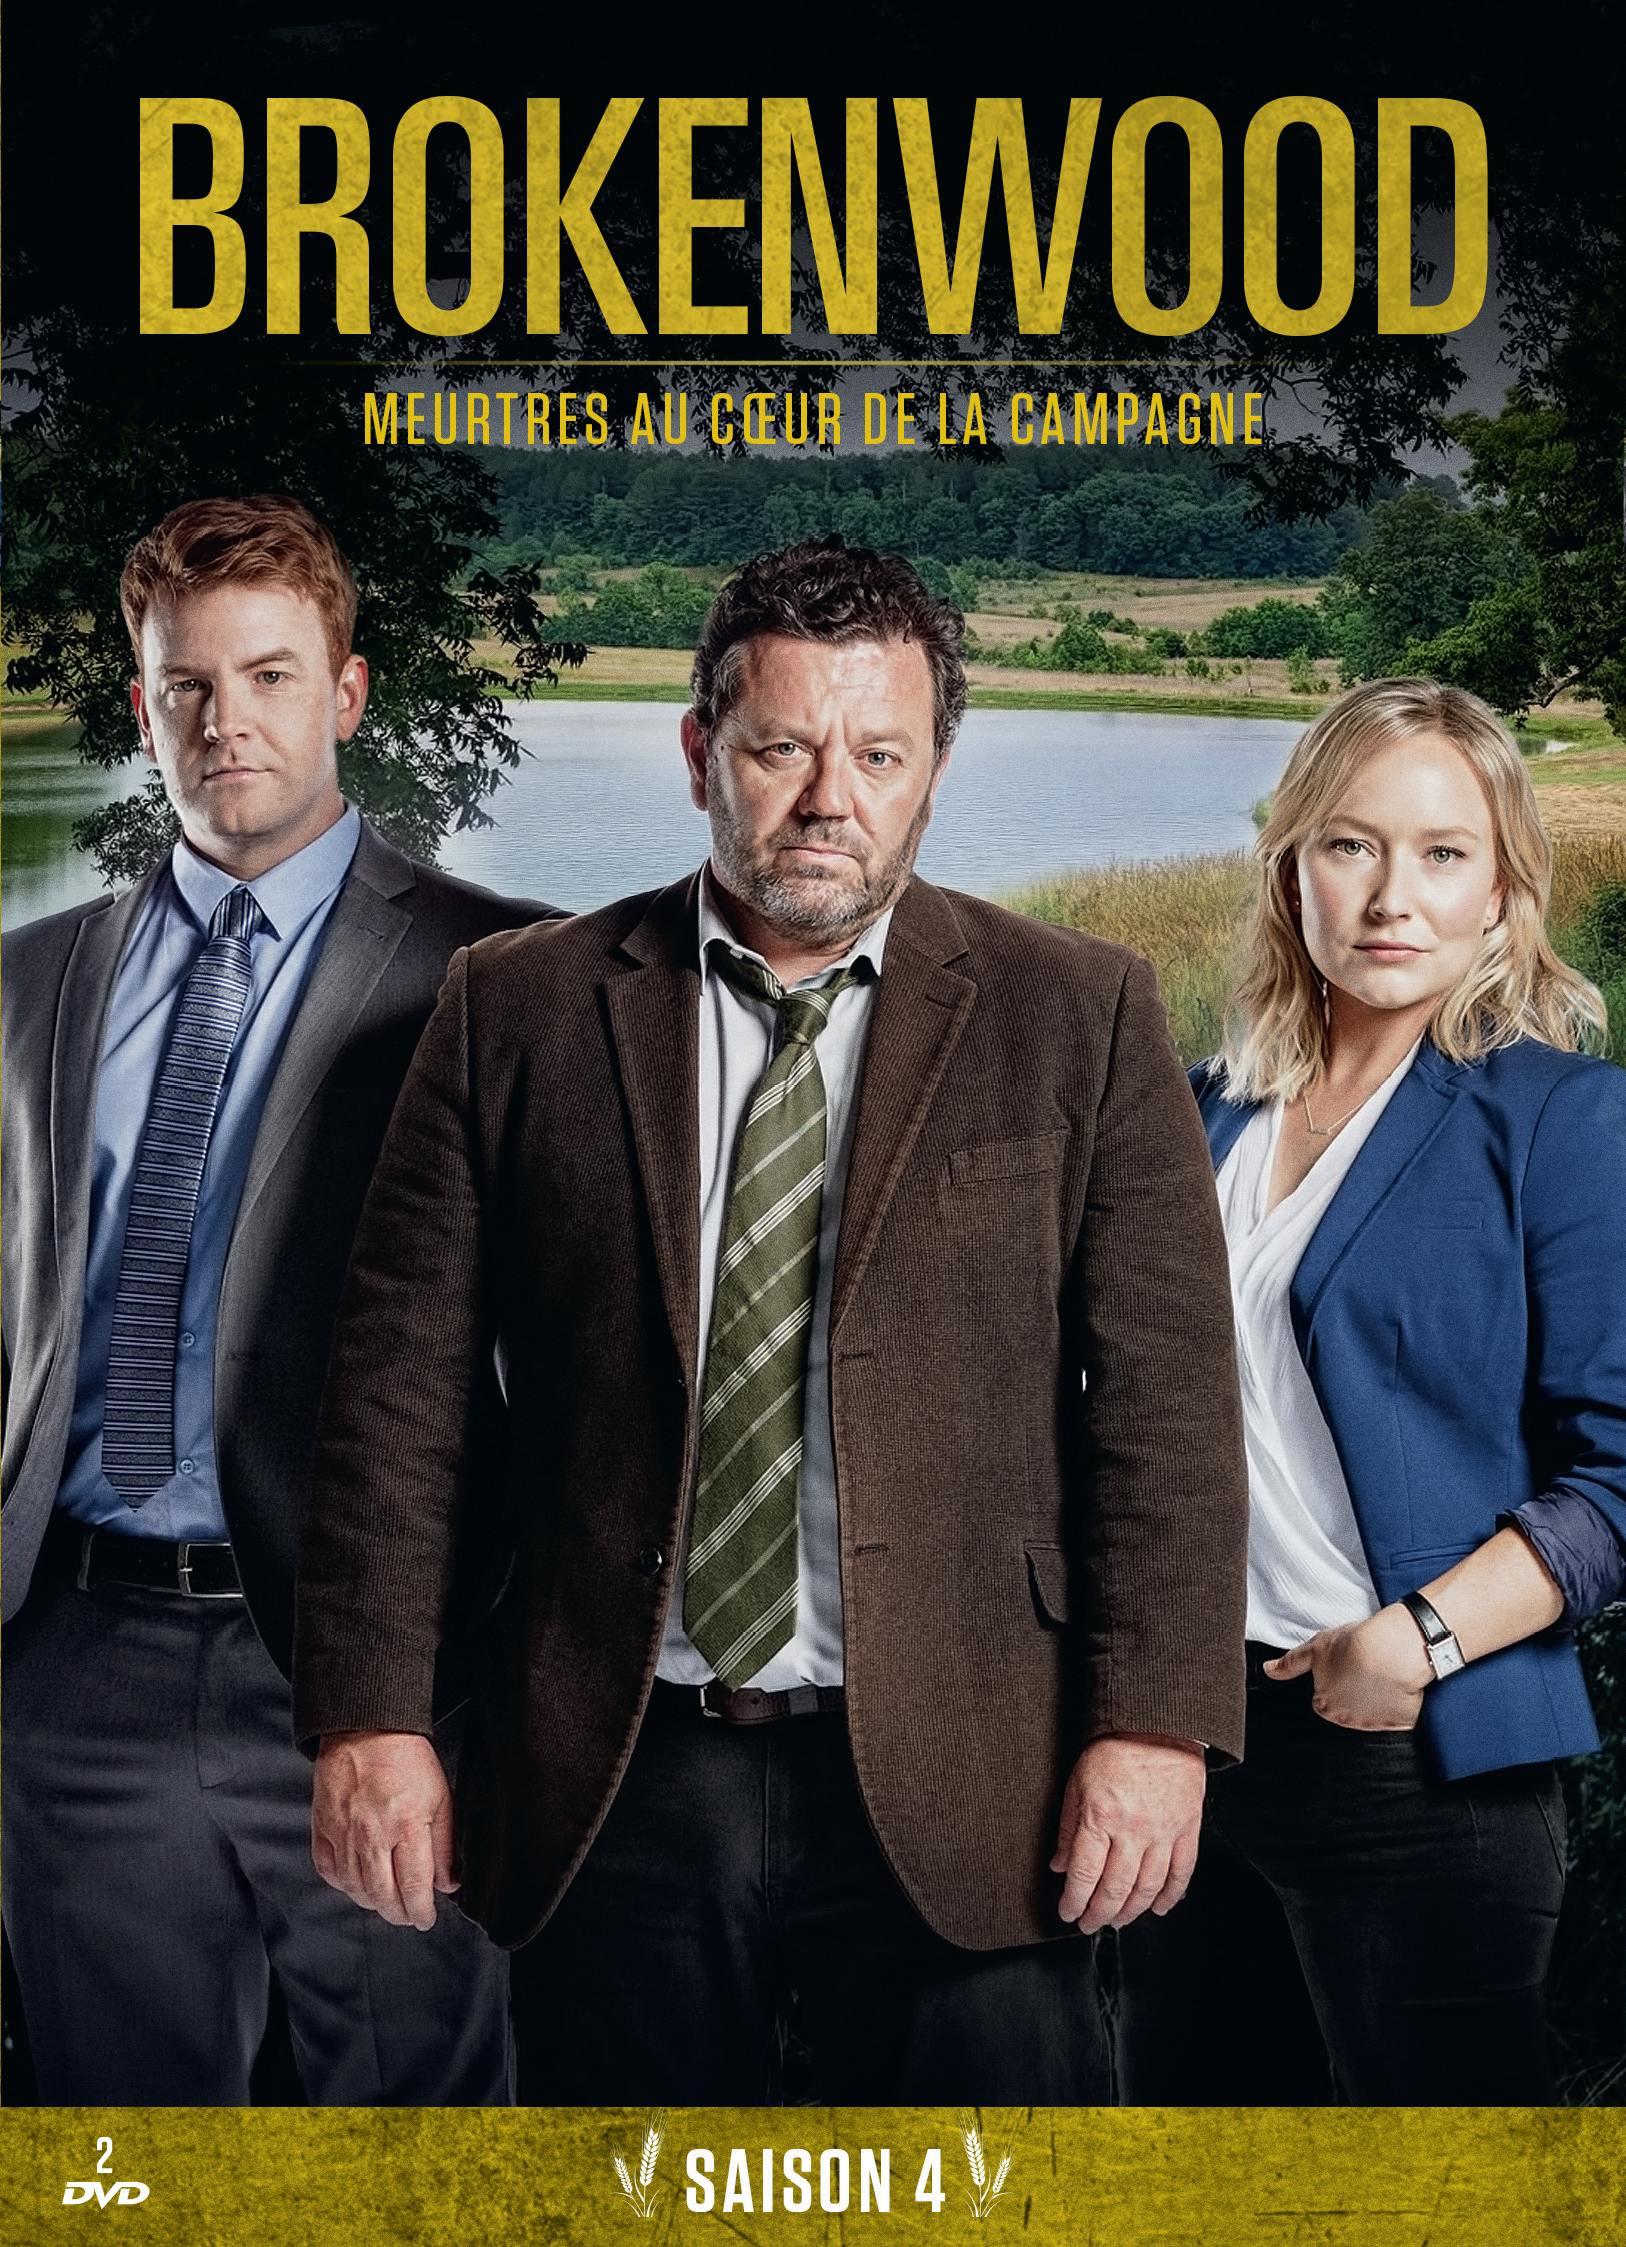 Brokenwood s4 sans fourreau - 2 dvd